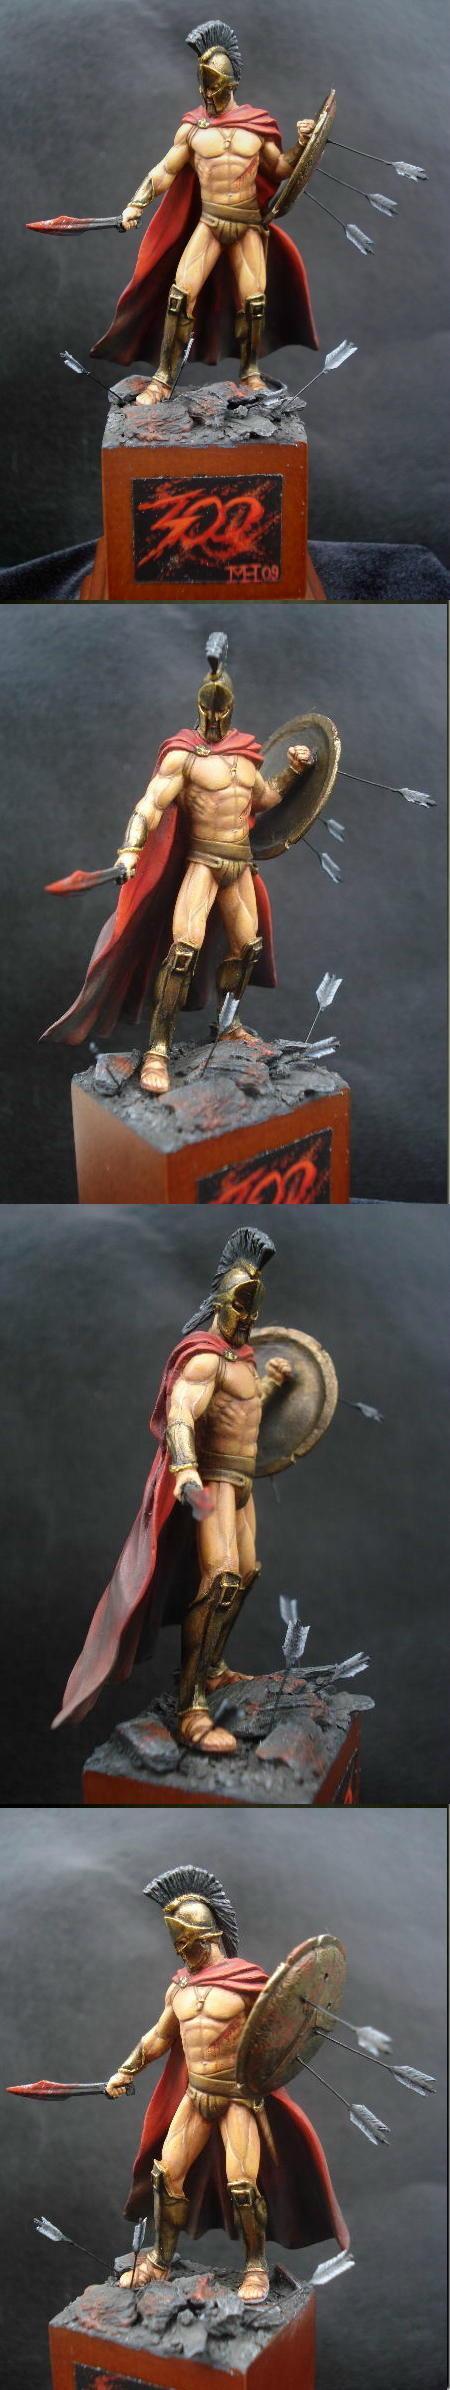 300, Helmet, Leonaidas, Shield, Spartan